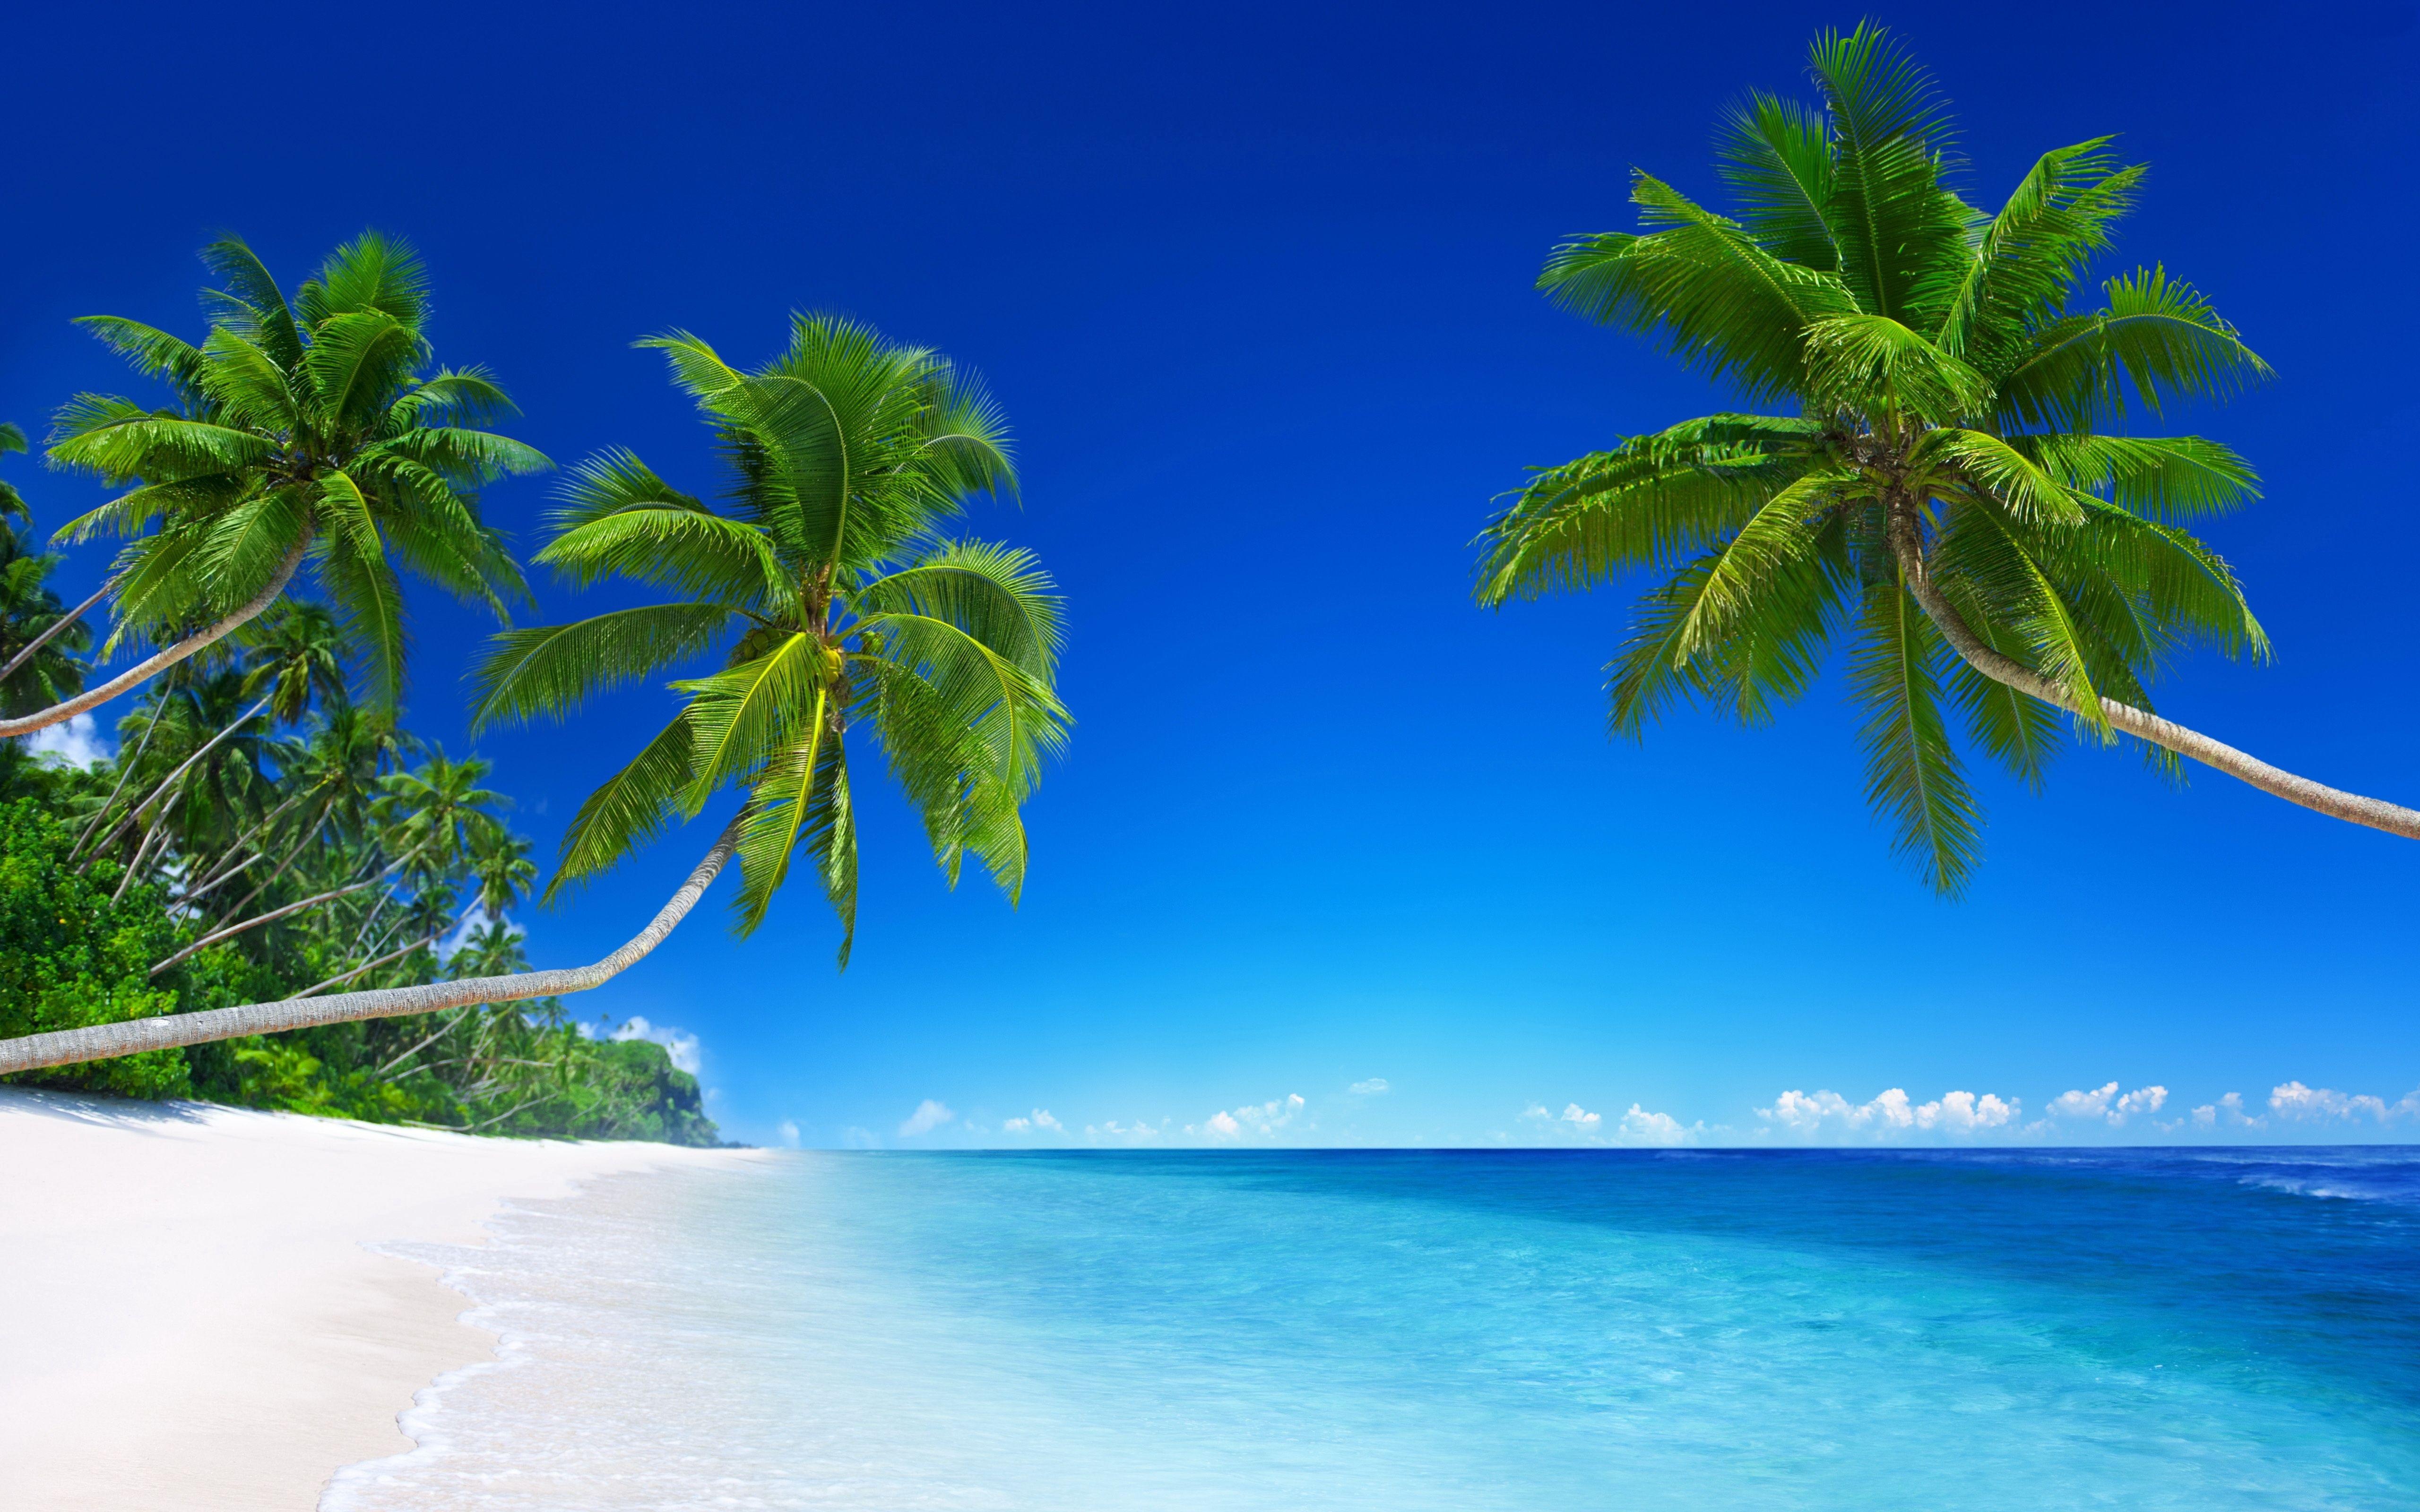 10 Best Tropical Beach Desktop Backgrounds Full Hd 1920 1080 For Pc Background In 2020 Beach Wallpaper Landscape Wallpaper Paradise Wallpaper